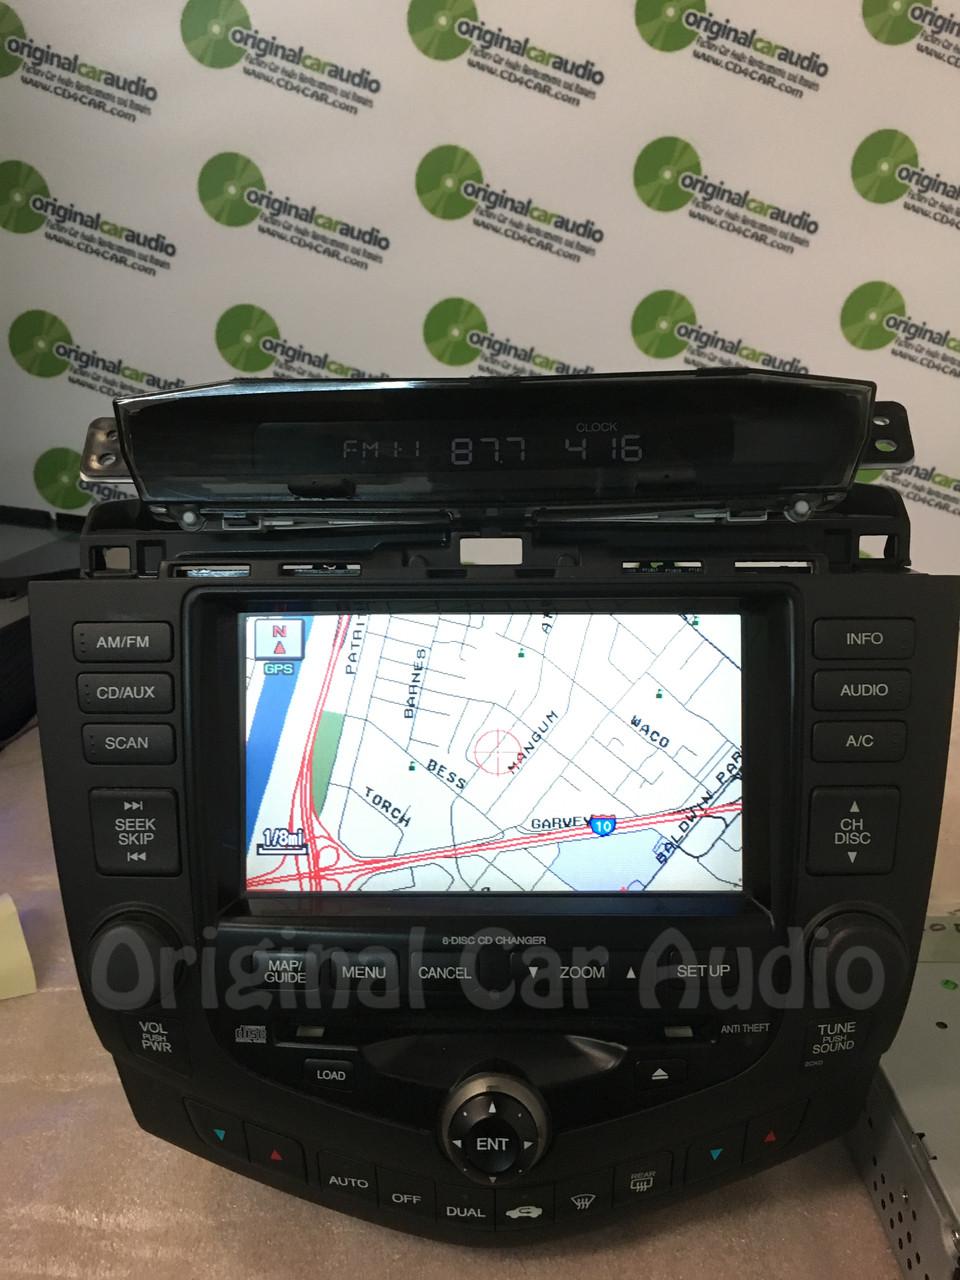 2004 2005 2006 2007 HONDA Accord Navigation GPS System Screen Radio 6 Disc Changer CD Player